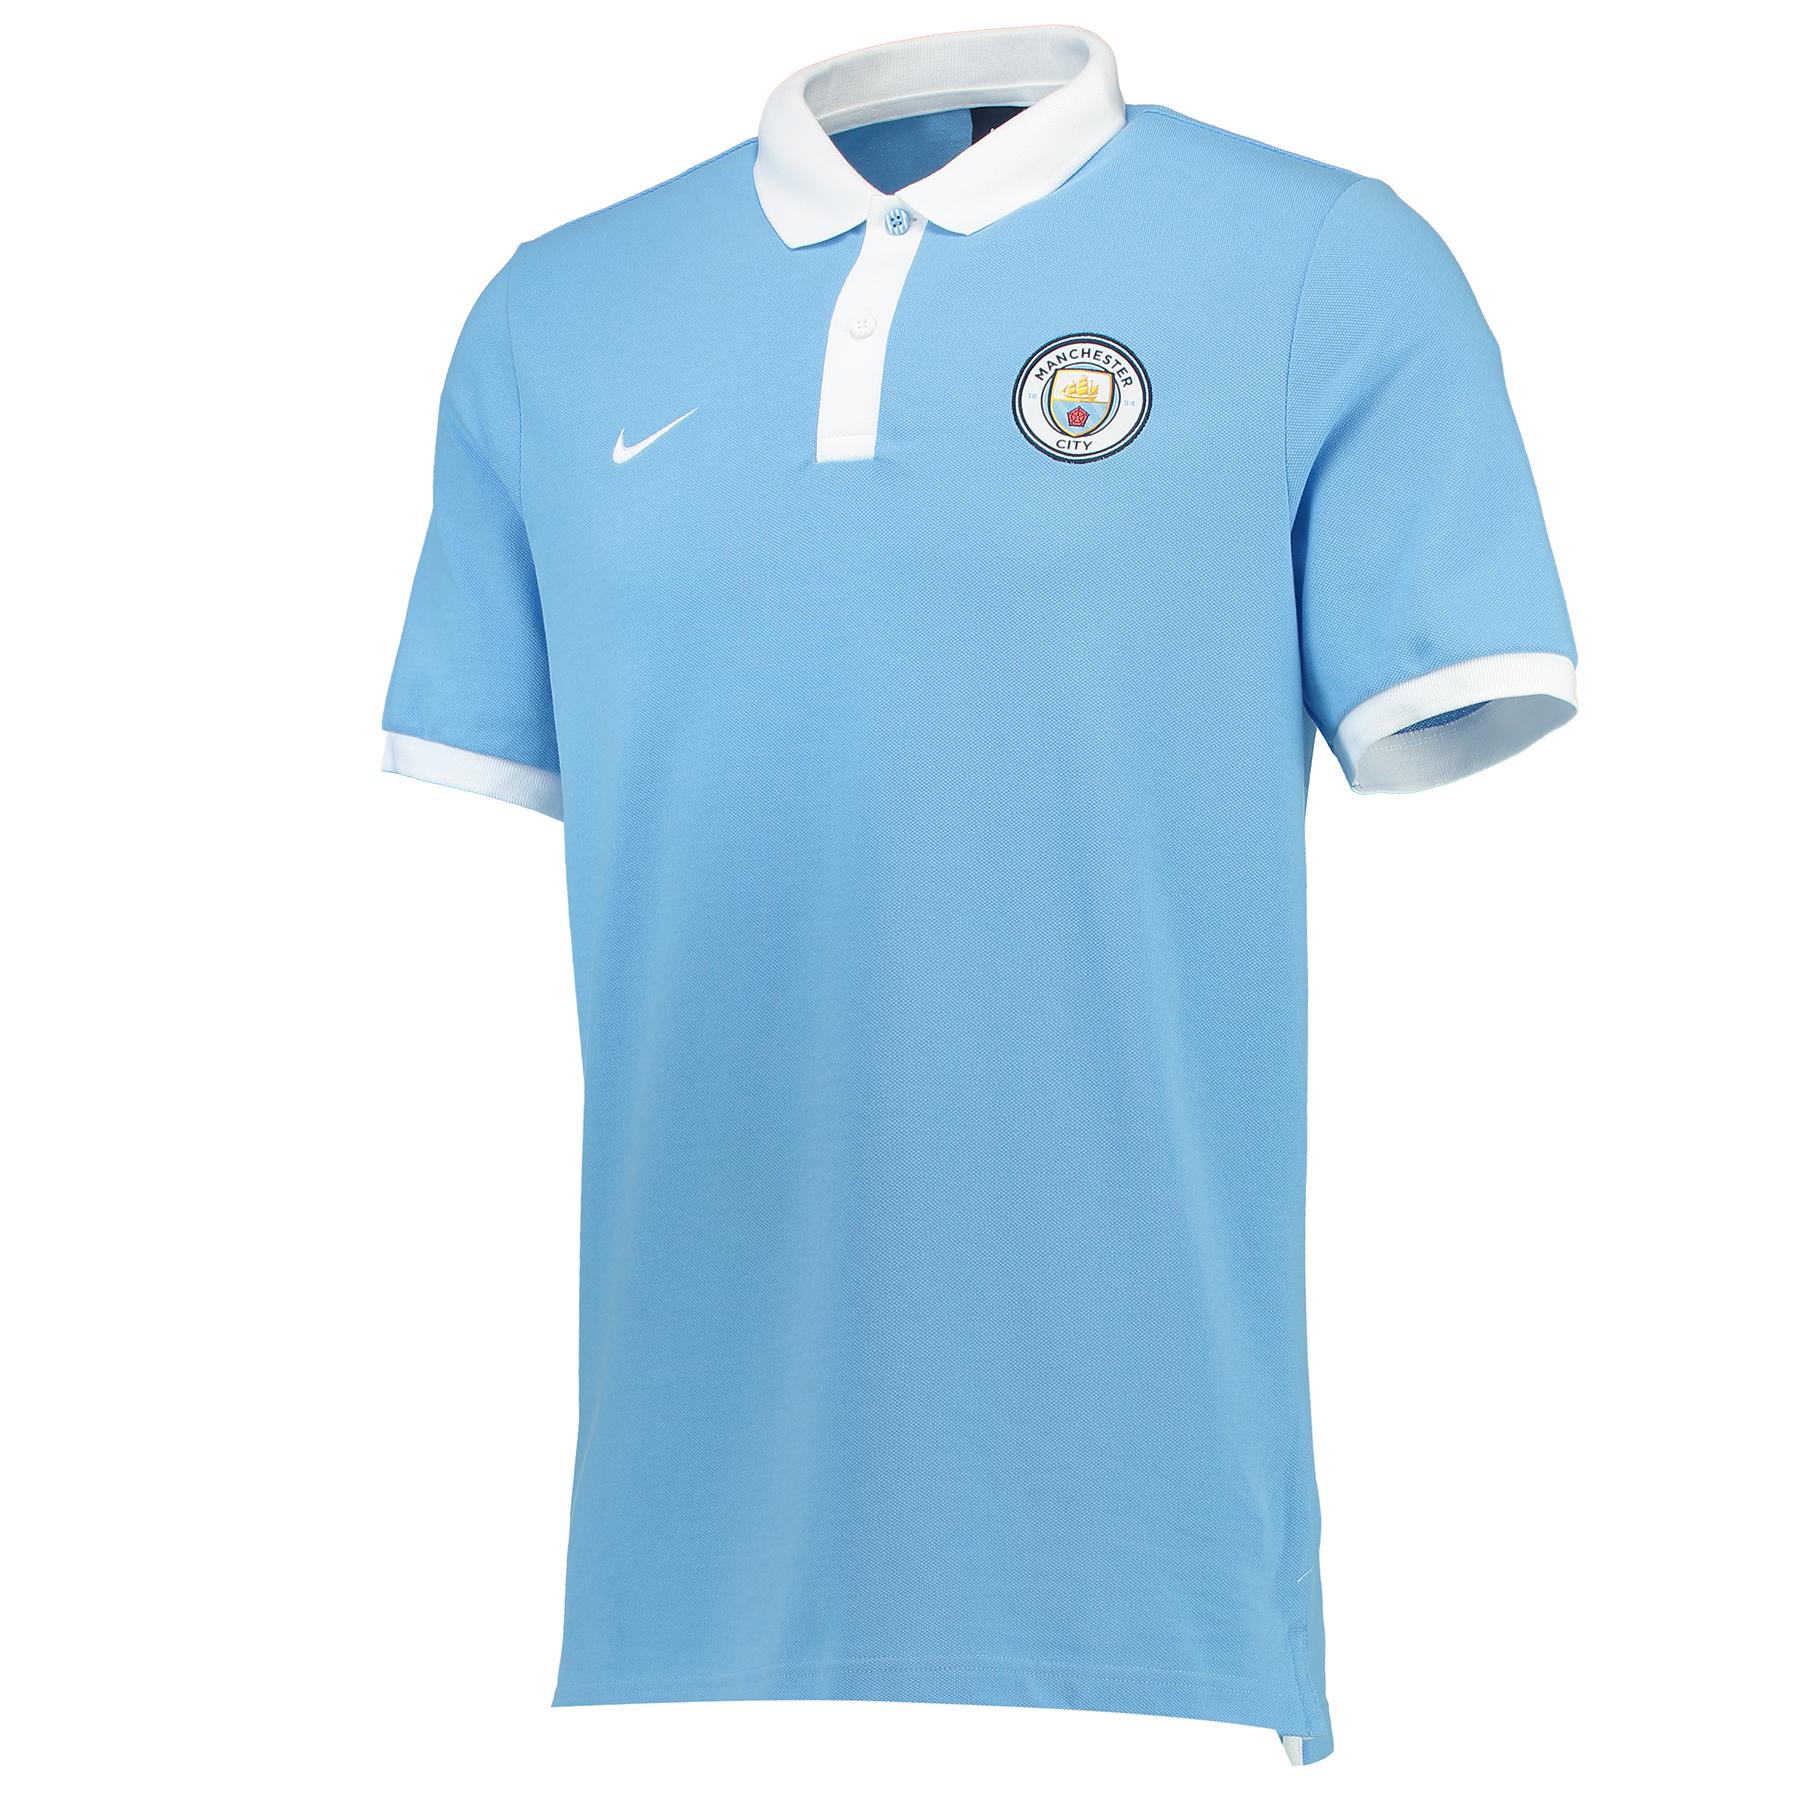 Manchester City Core Polo - Light Blue